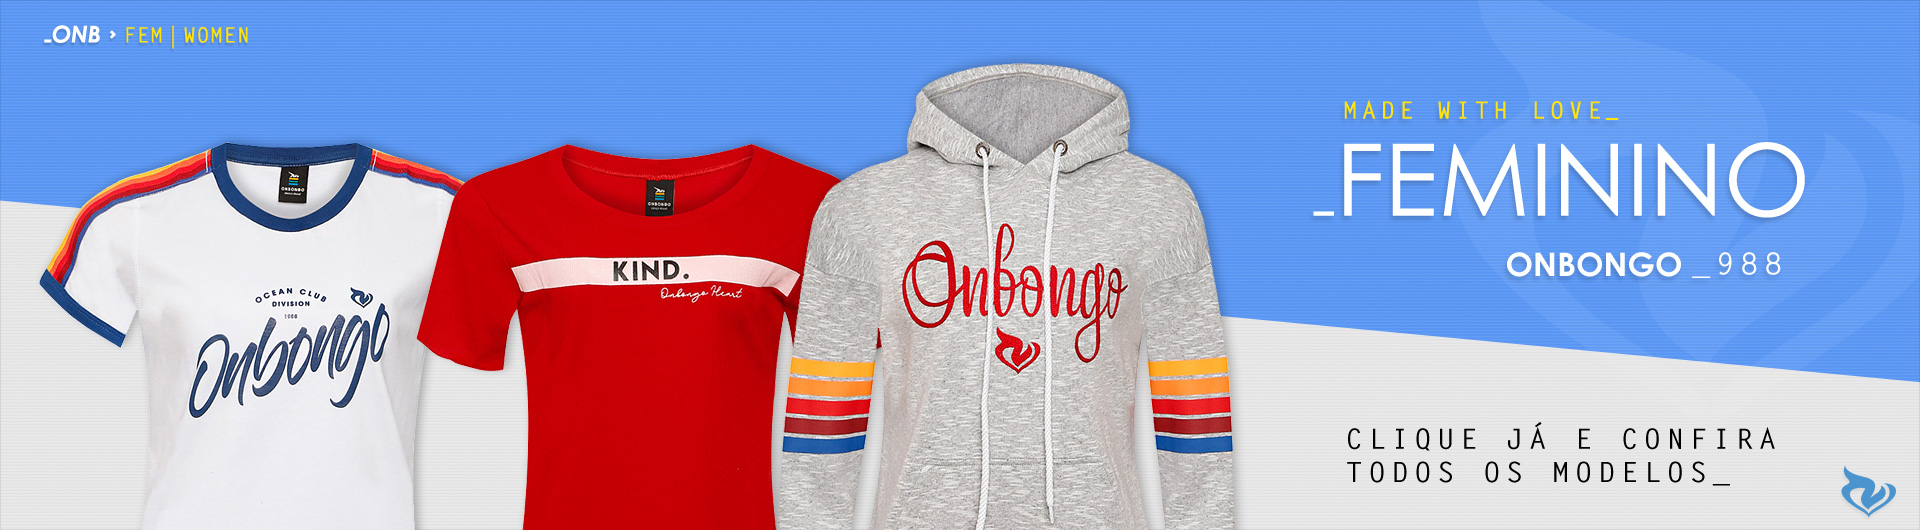 Feminino Onbongo - Loja Virtual Oficial